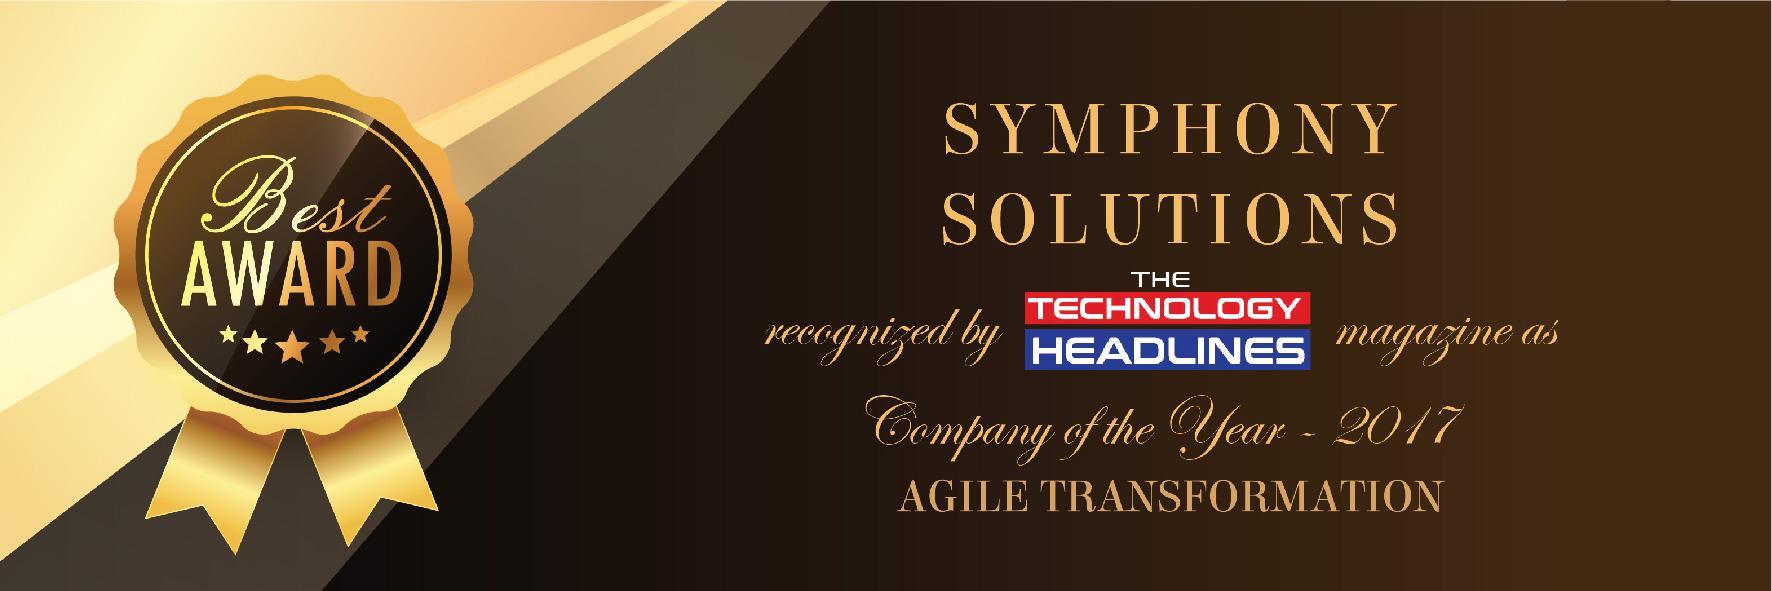 Symphony Solutions - Agile Award